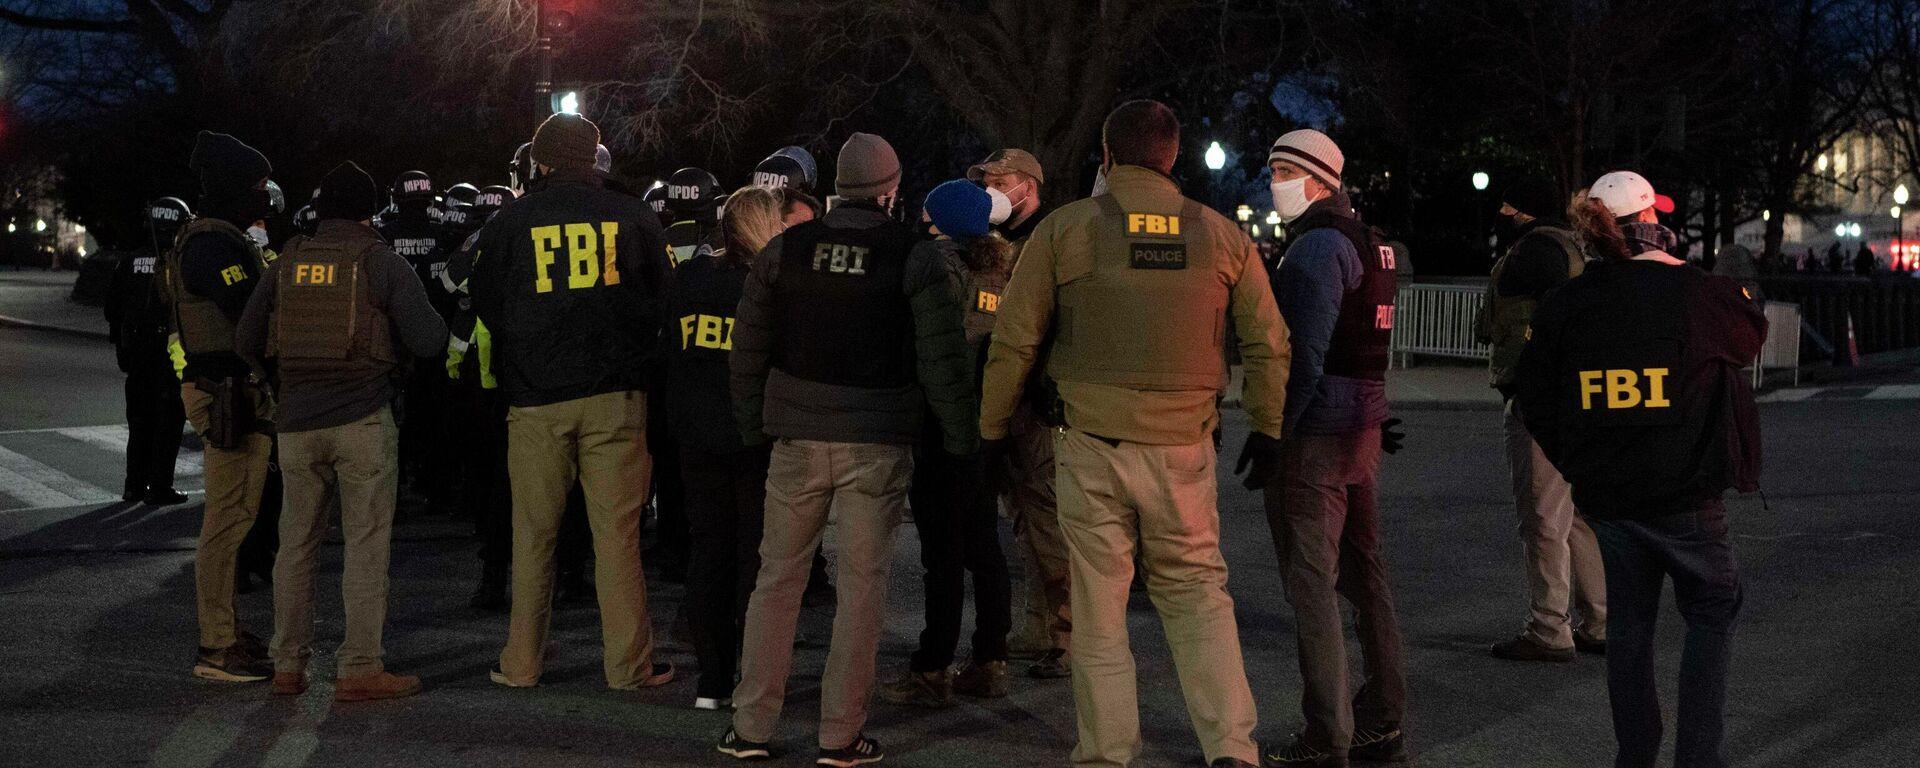 FBI-Beamte während Protesten in Washington am 6. Januar 2021 - SNA, 1920, 08.01.2021